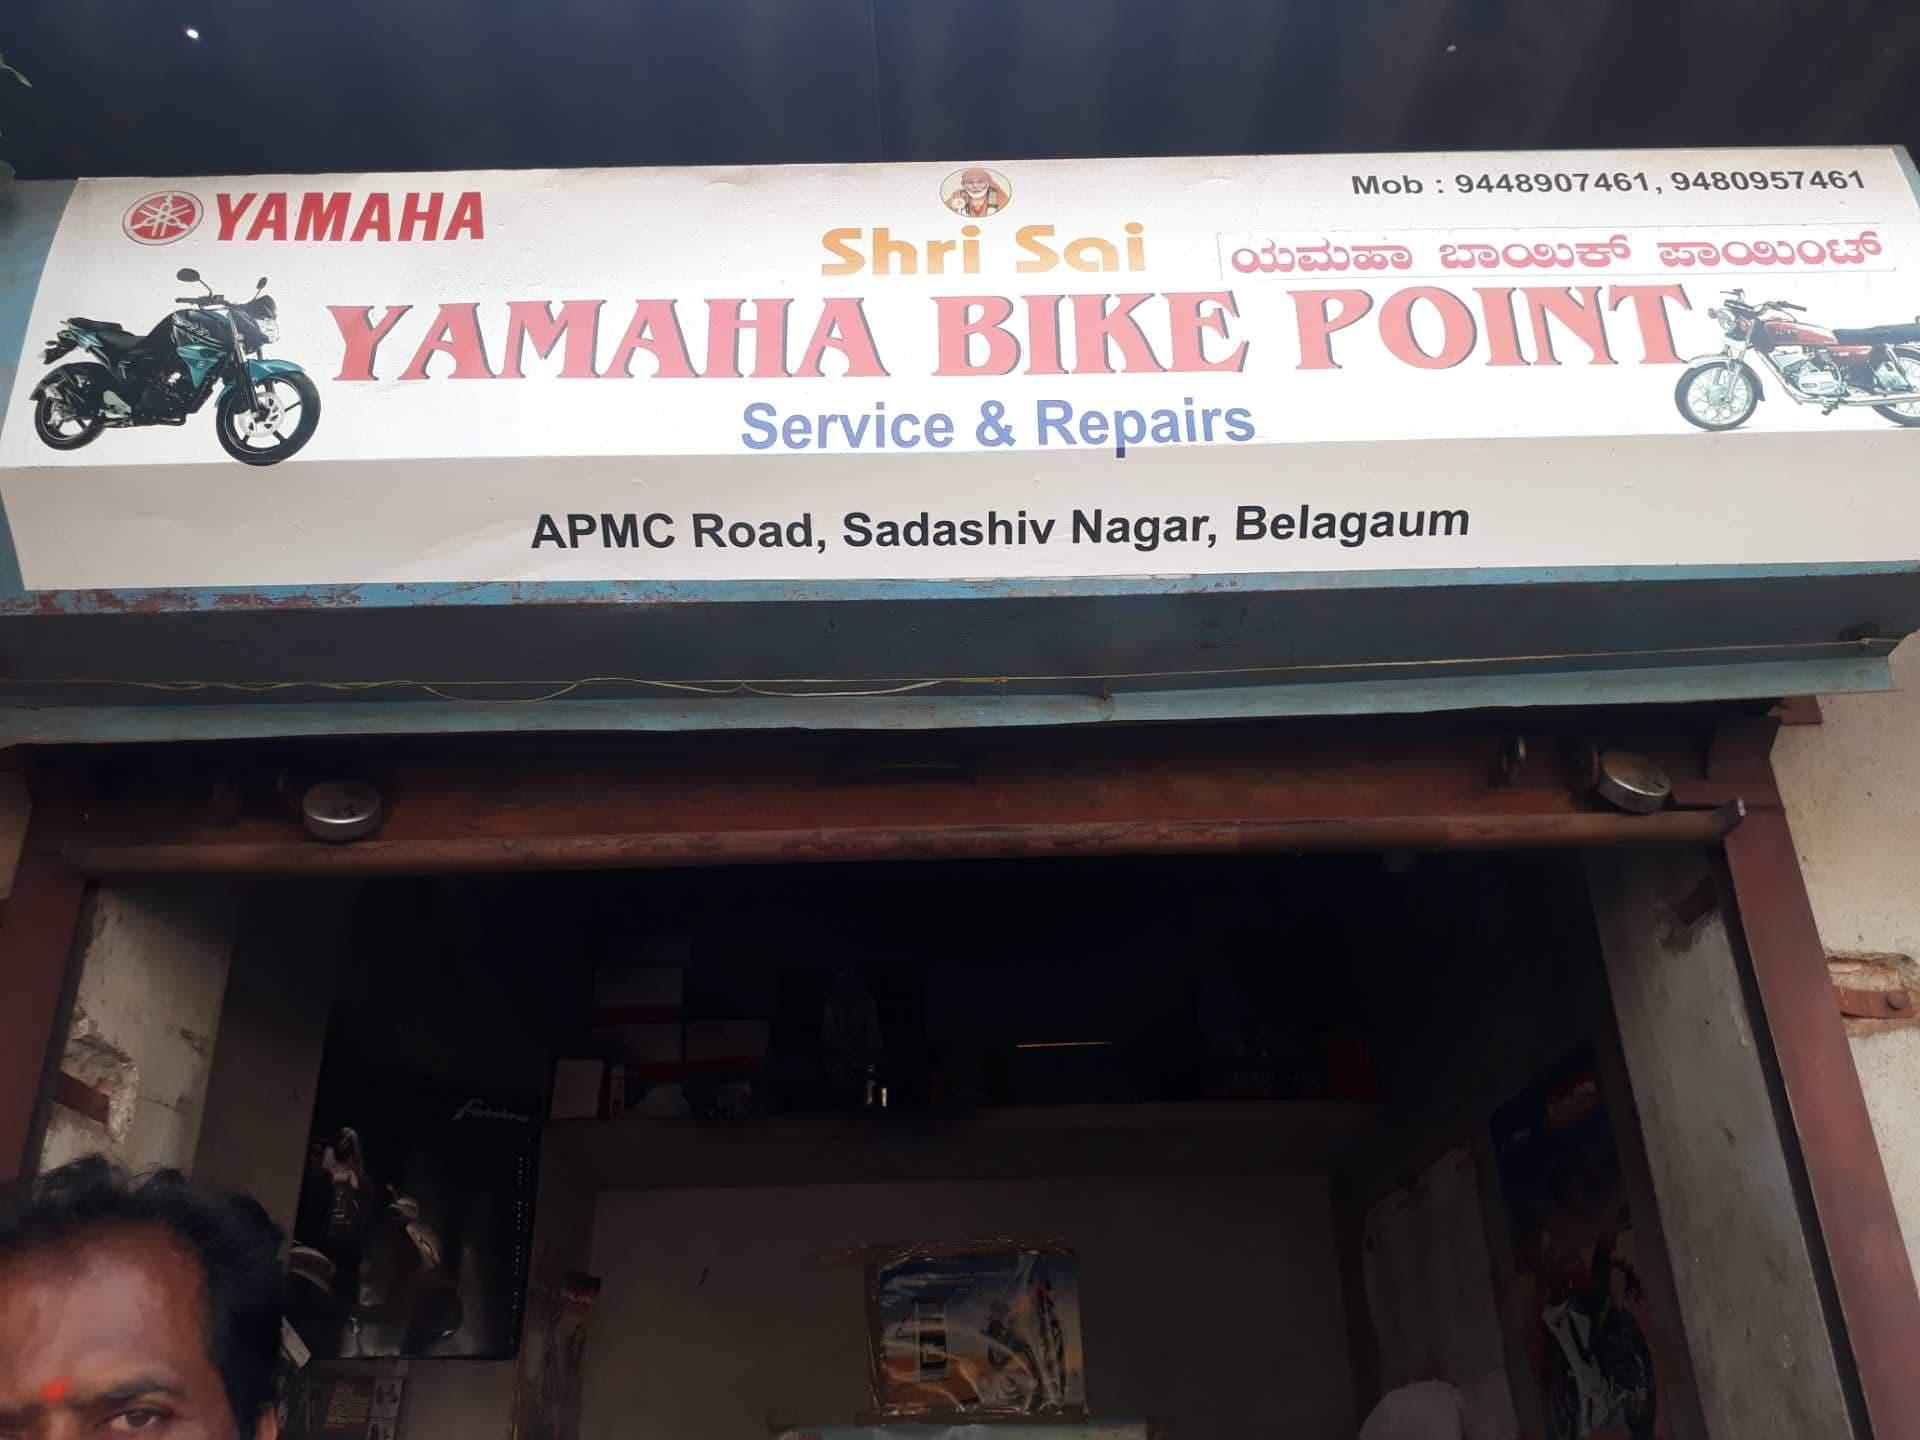 Top 10 Yamaha Motorcycle Showrooms in Belgaum - Yamaha Bikes - Justdial